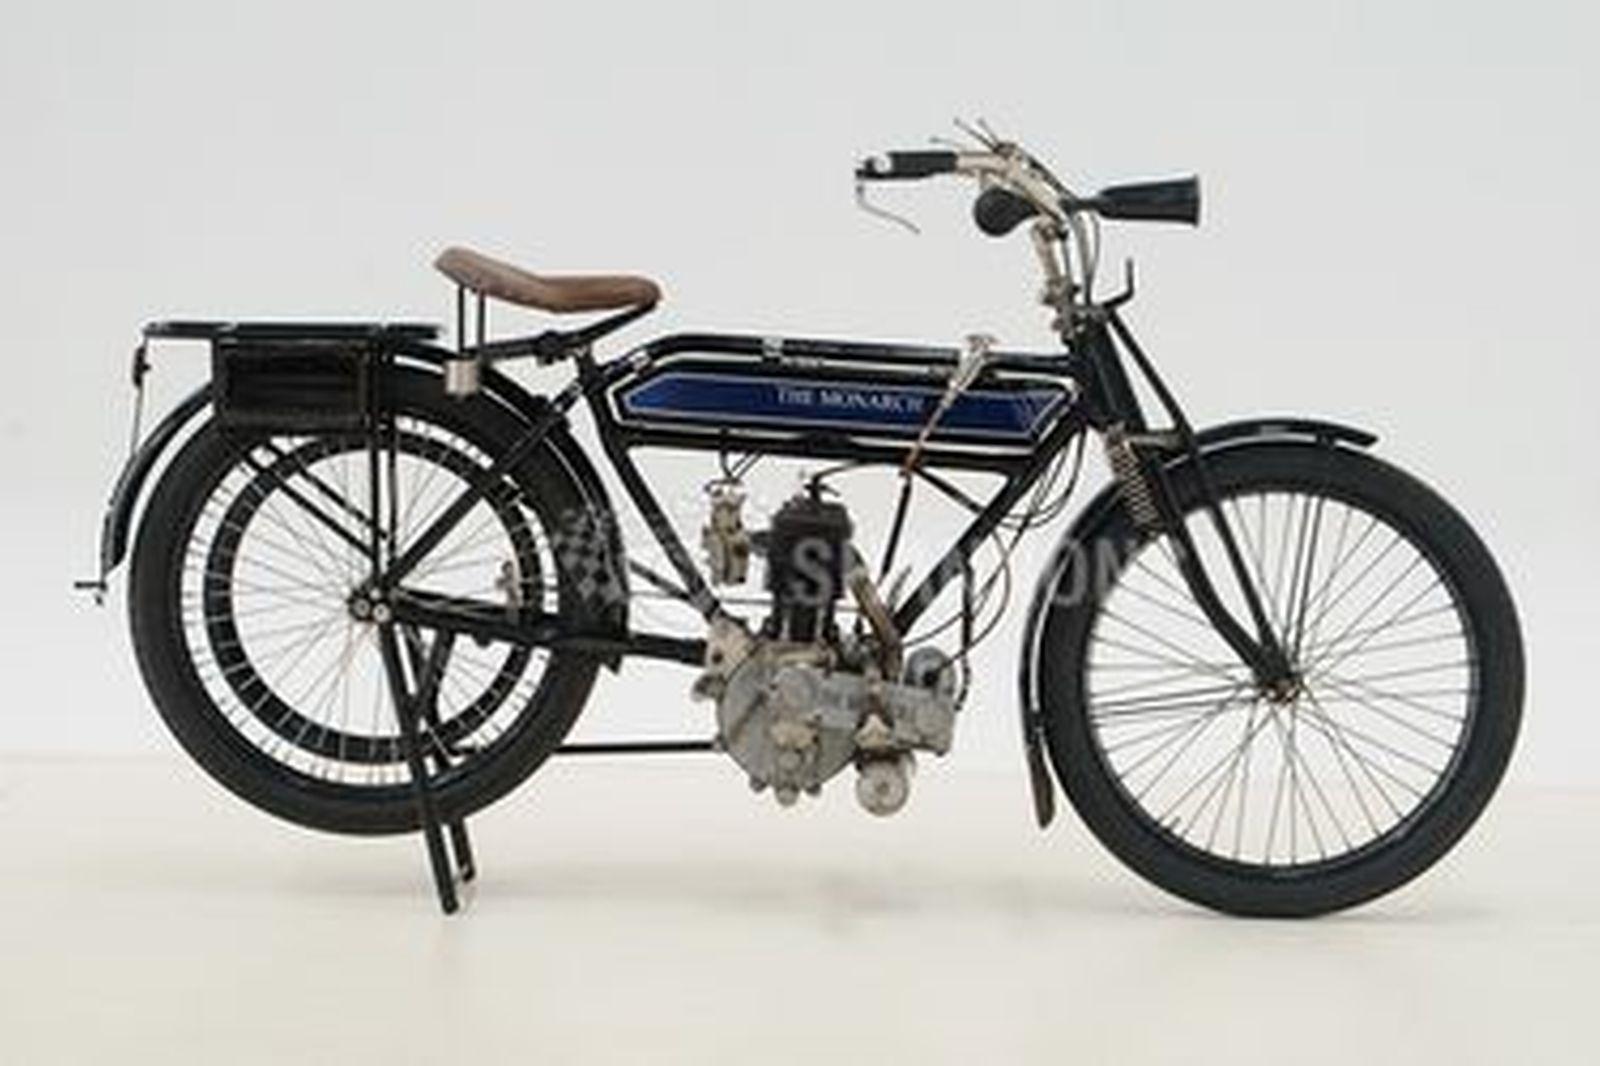 The Monarch 'Jap' 500cc Motorcycle